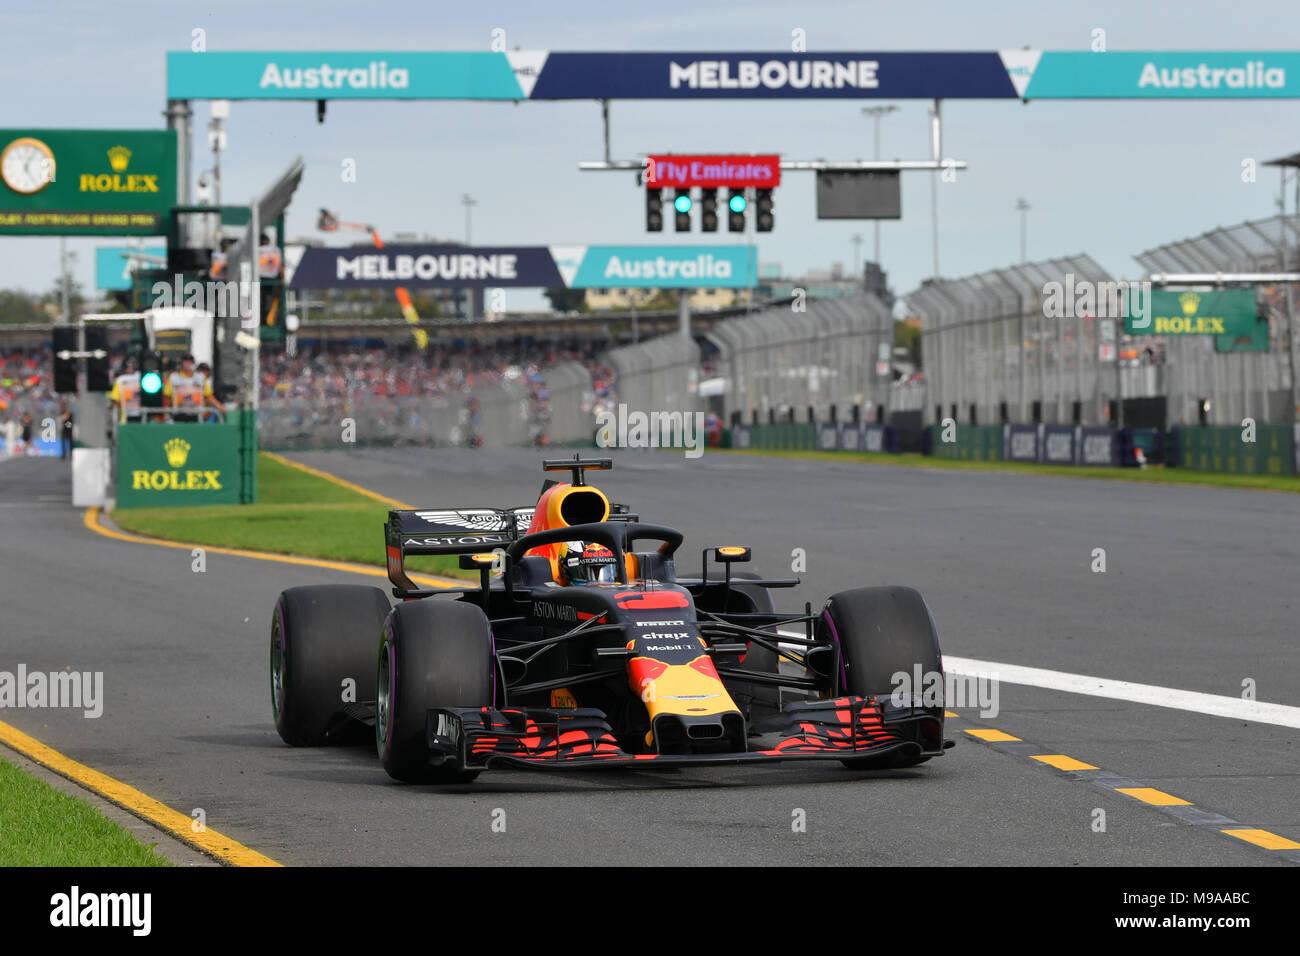 Albert Park Melbourne Australia 24th Mar 2018 Daniel Ricciardo AUS